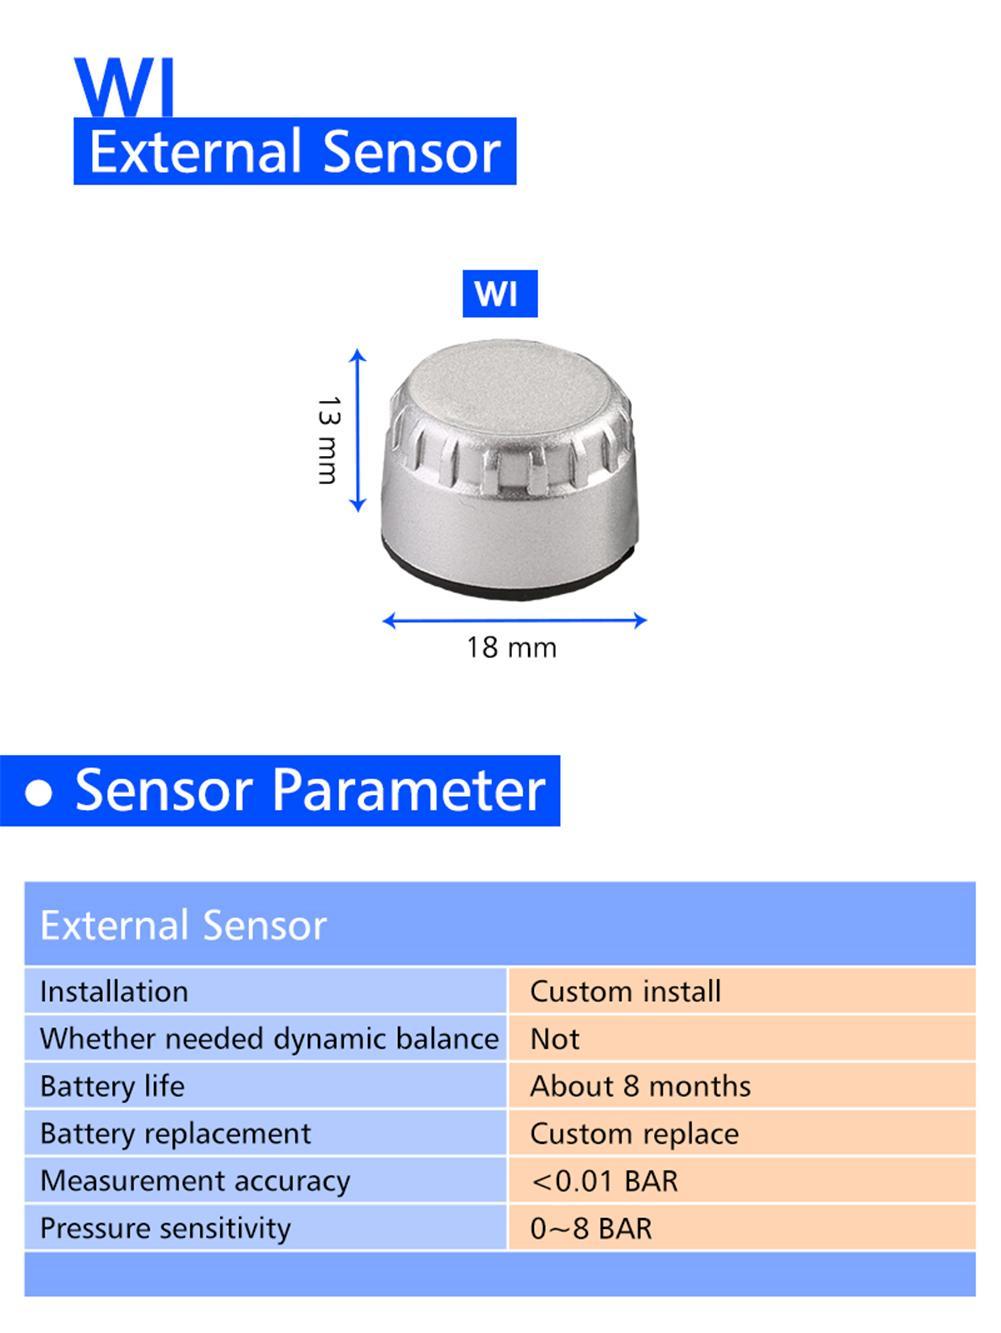 Careud M3 B Wireless Motorcycle Tpms Tire Pressure Monitoring System Sensor Circuit Diagram Motor 2 External Internal Sensors In Alarm From